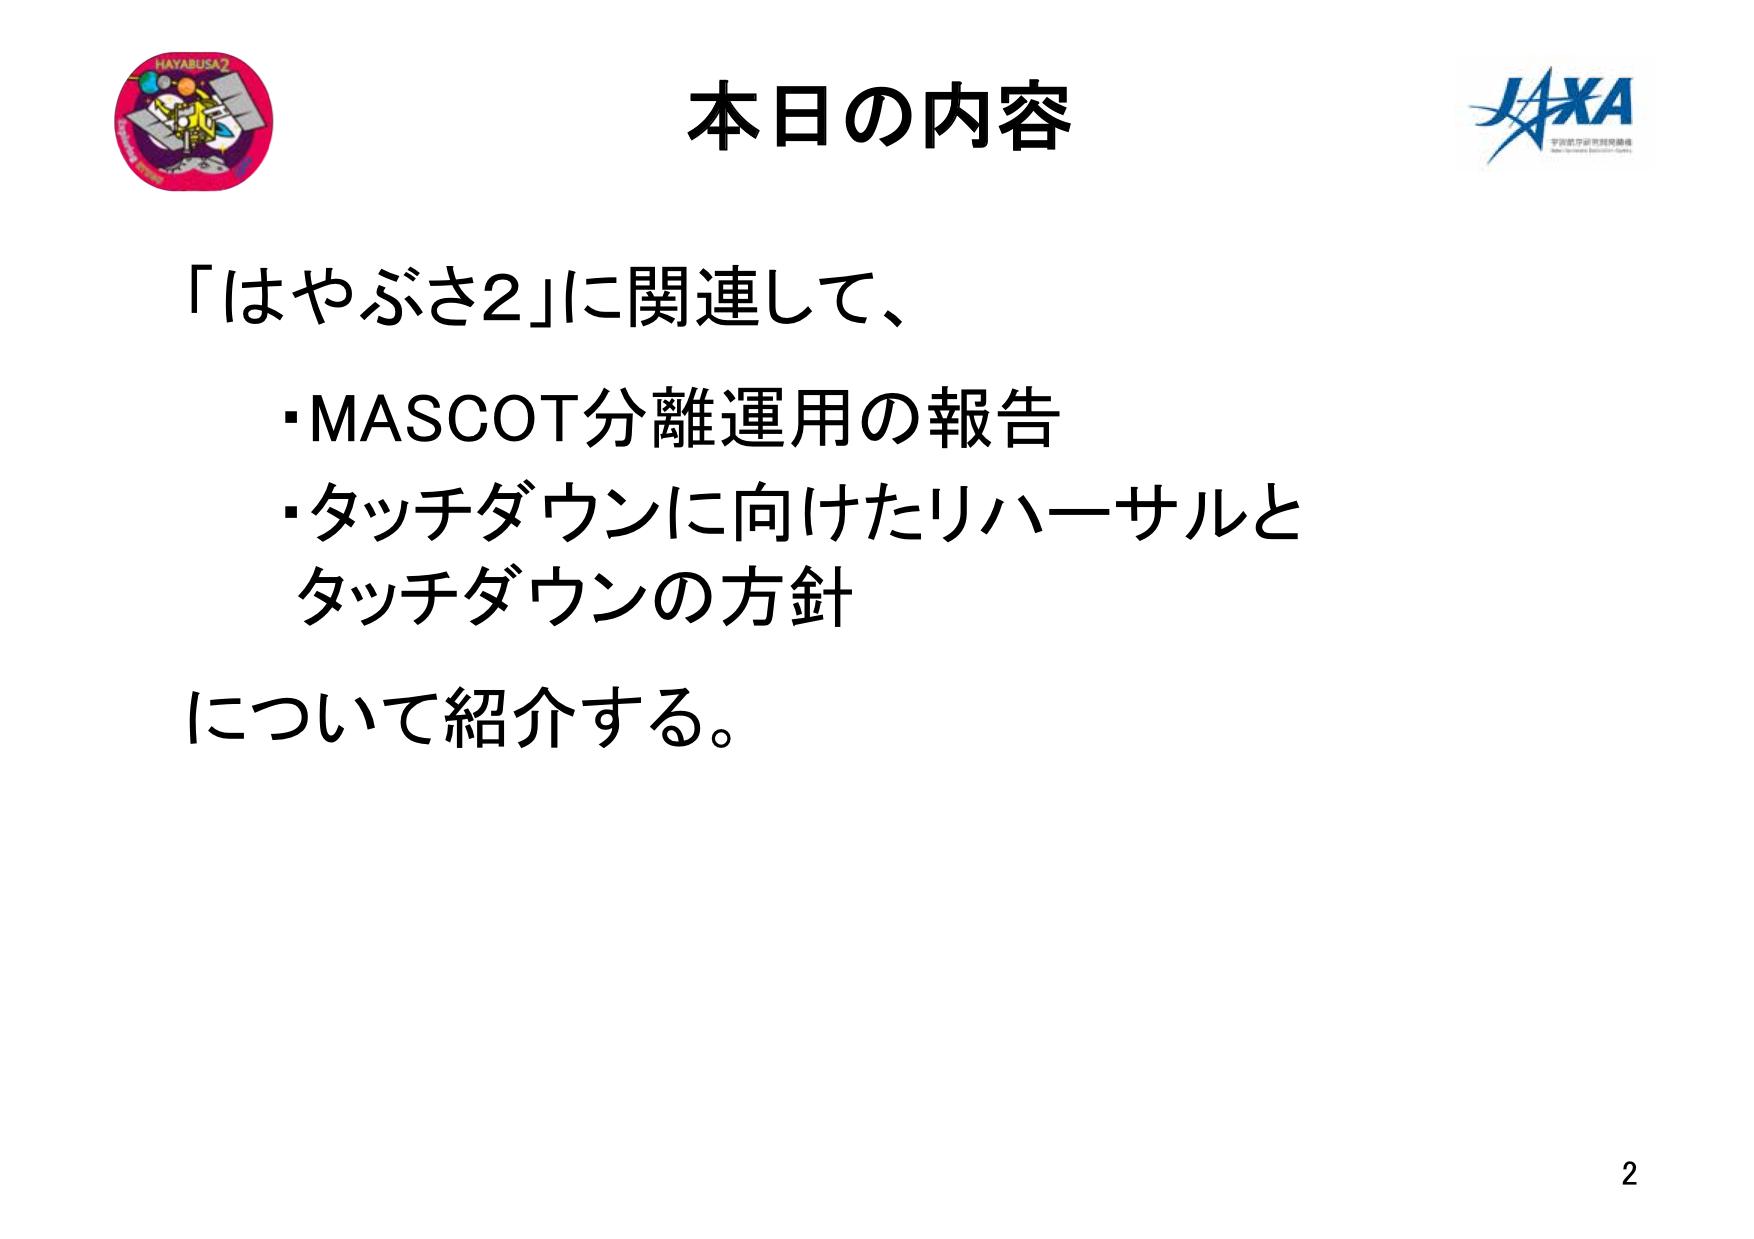 f:id:Imamura:20181011153941p:plain